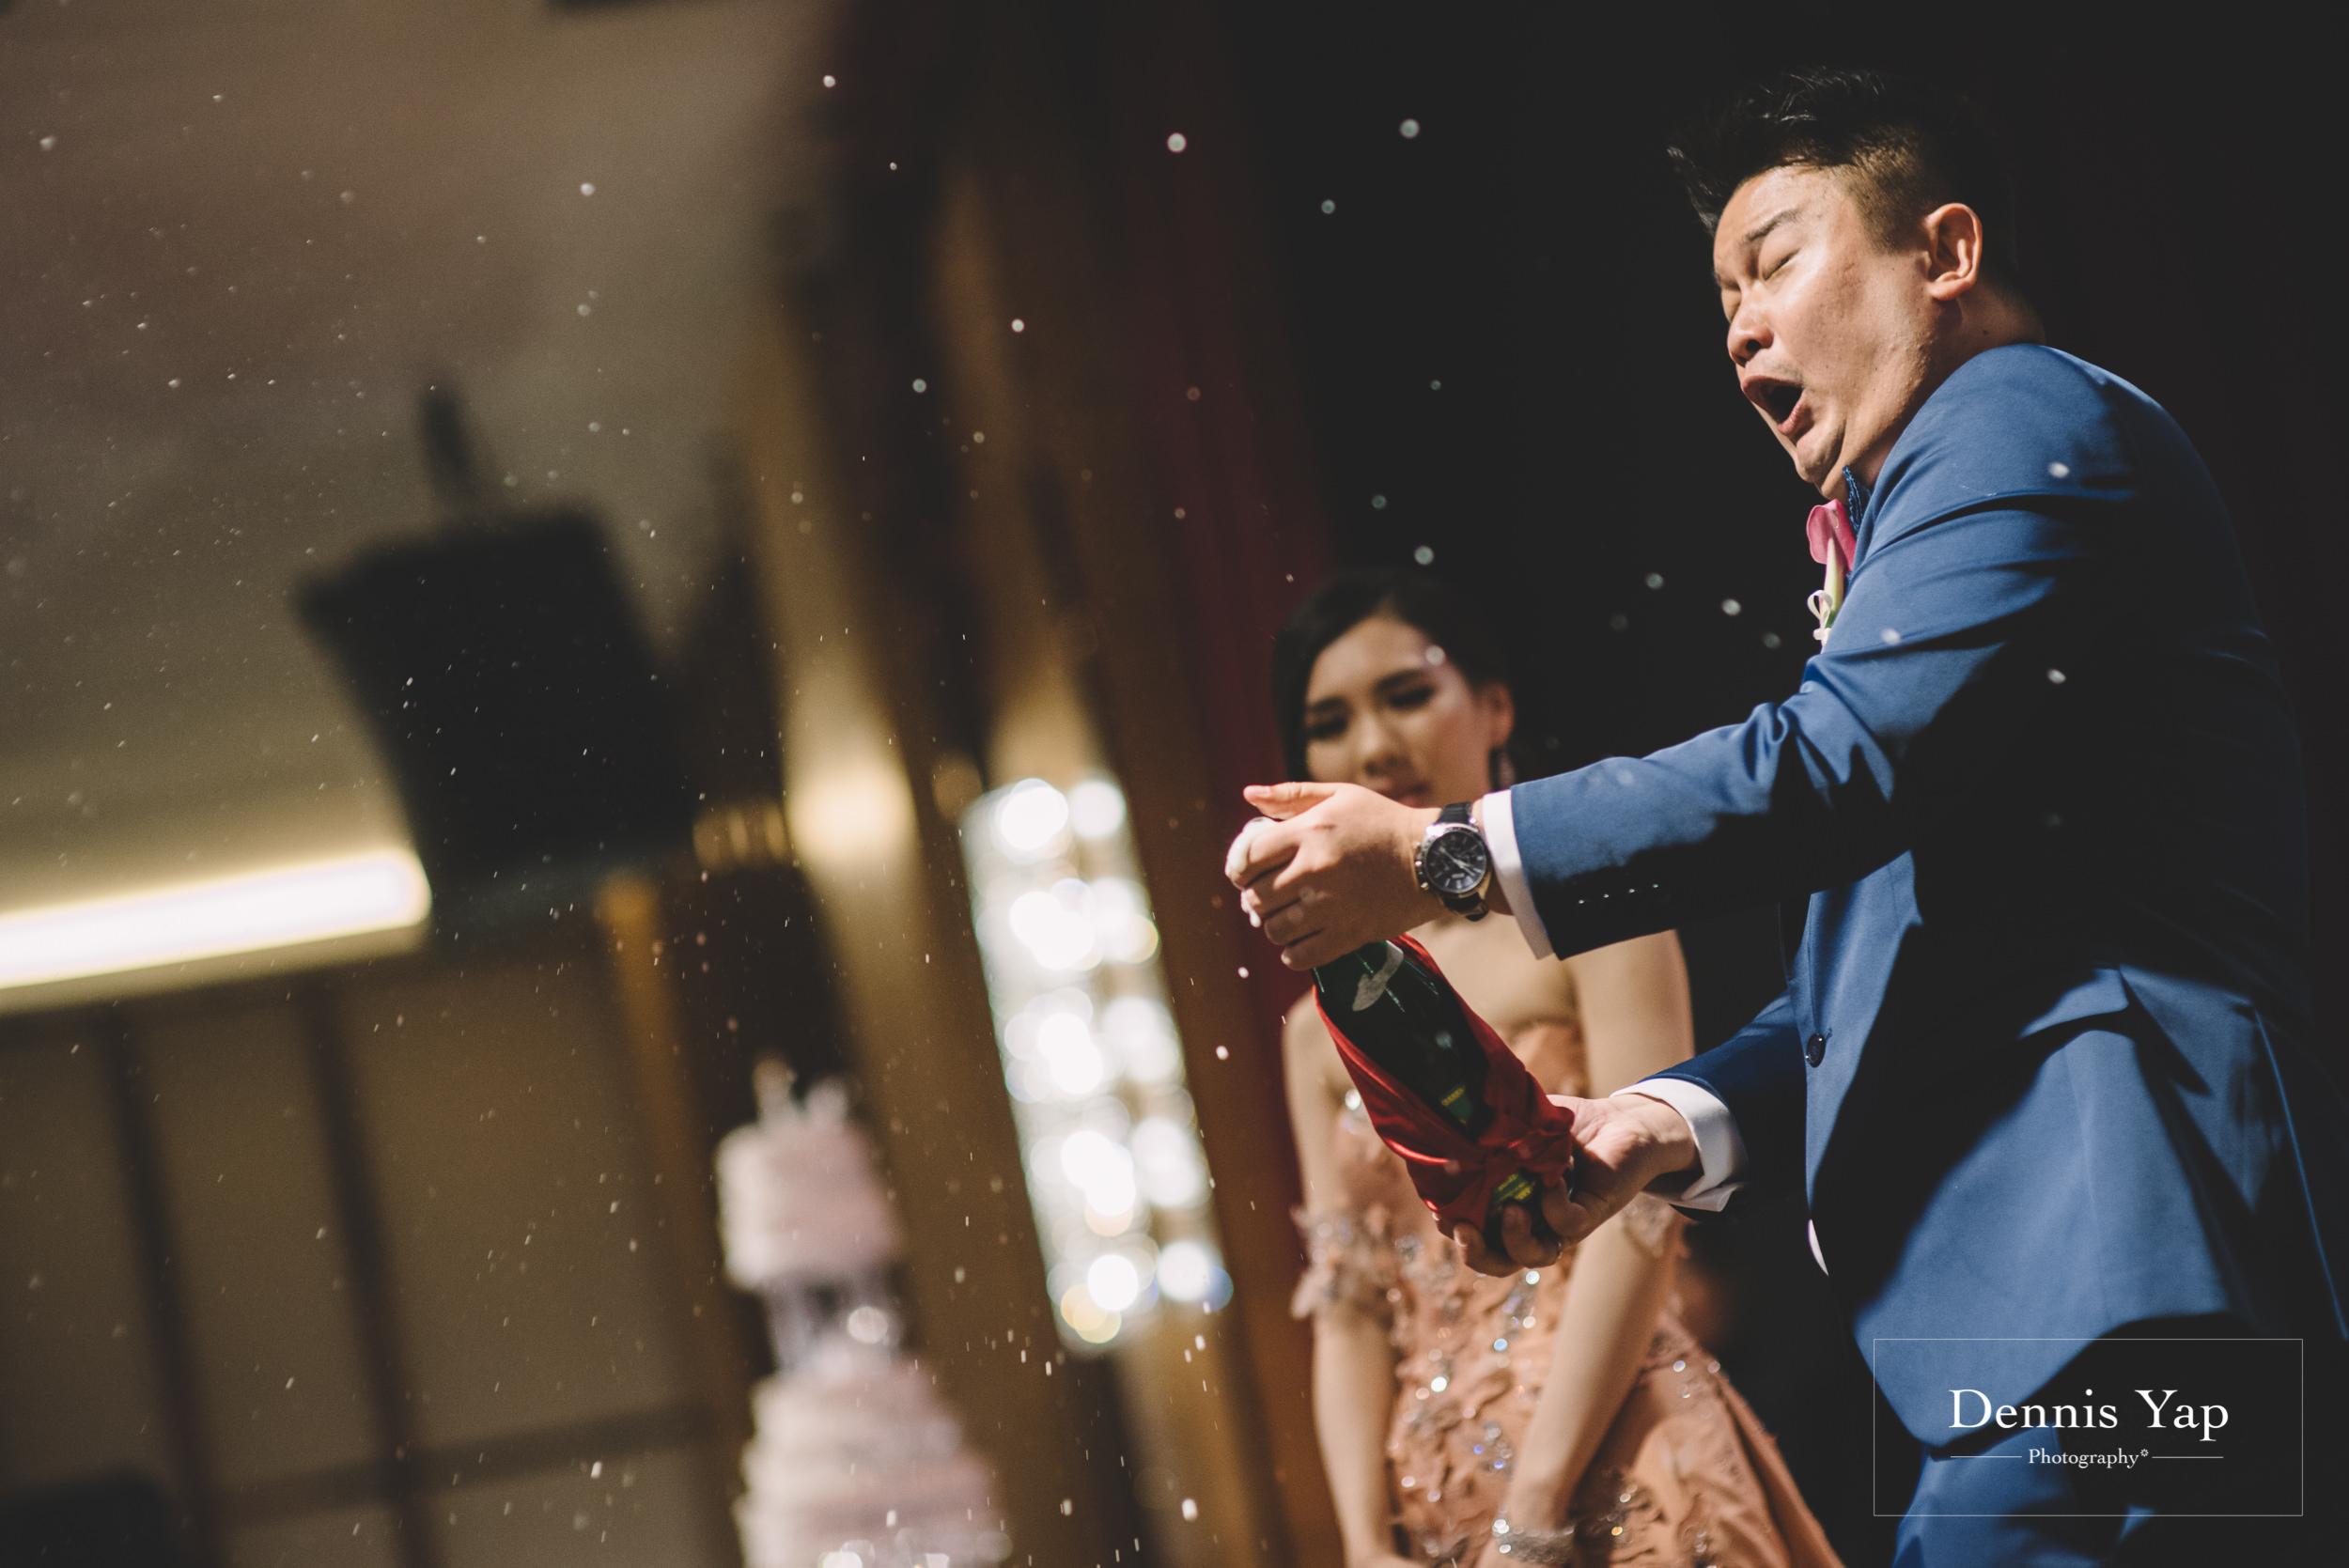 johnson joanne wedding dinner klang centro malaysia wedding photographer dennis yap-16.jpg